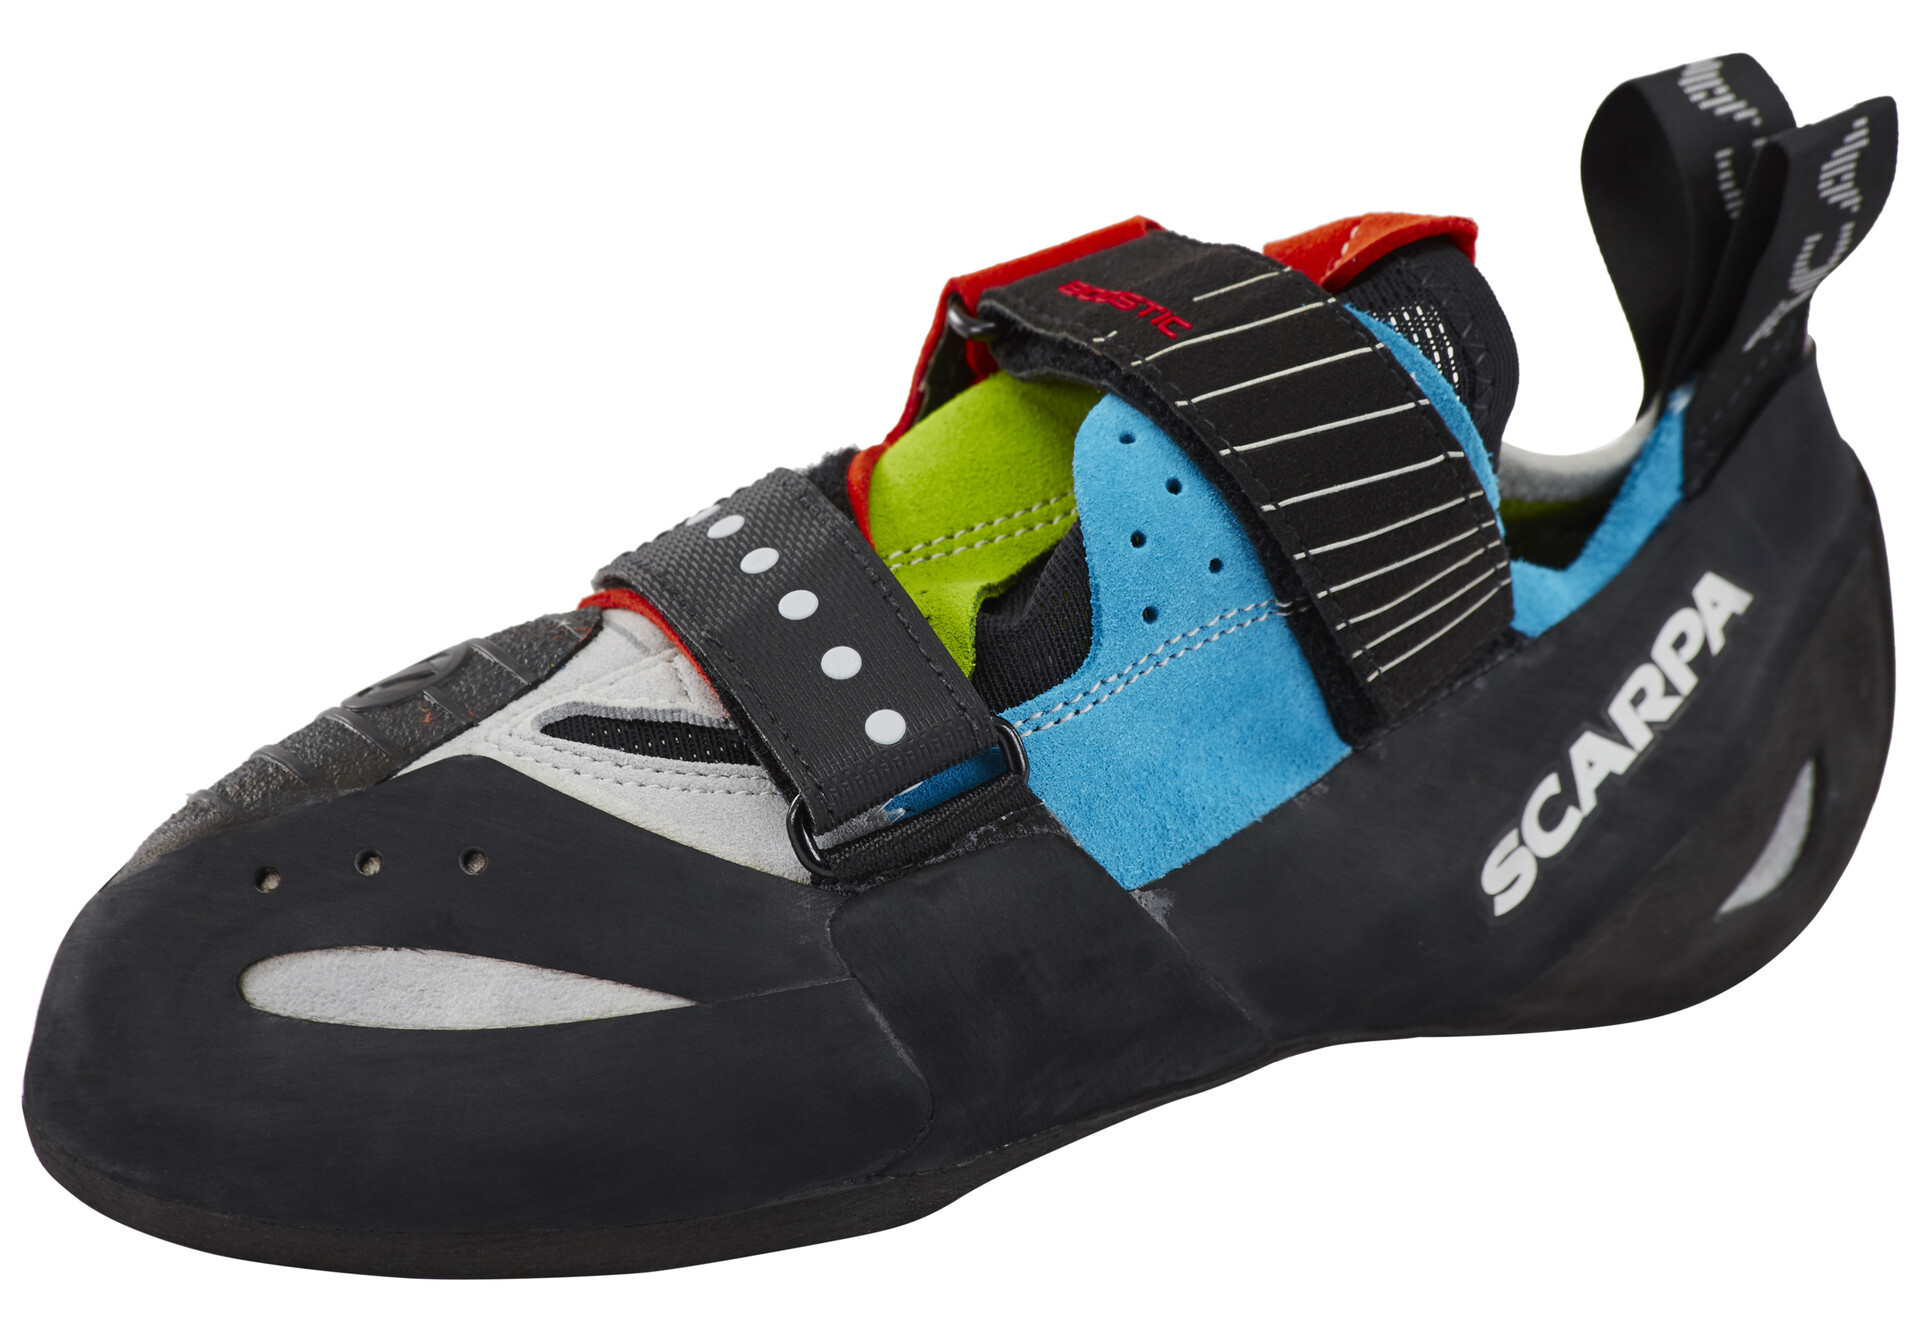 Bleunoir D'escalade Boostic Scarpa Chaussures Scarpa Boostic vn1Uvq8X